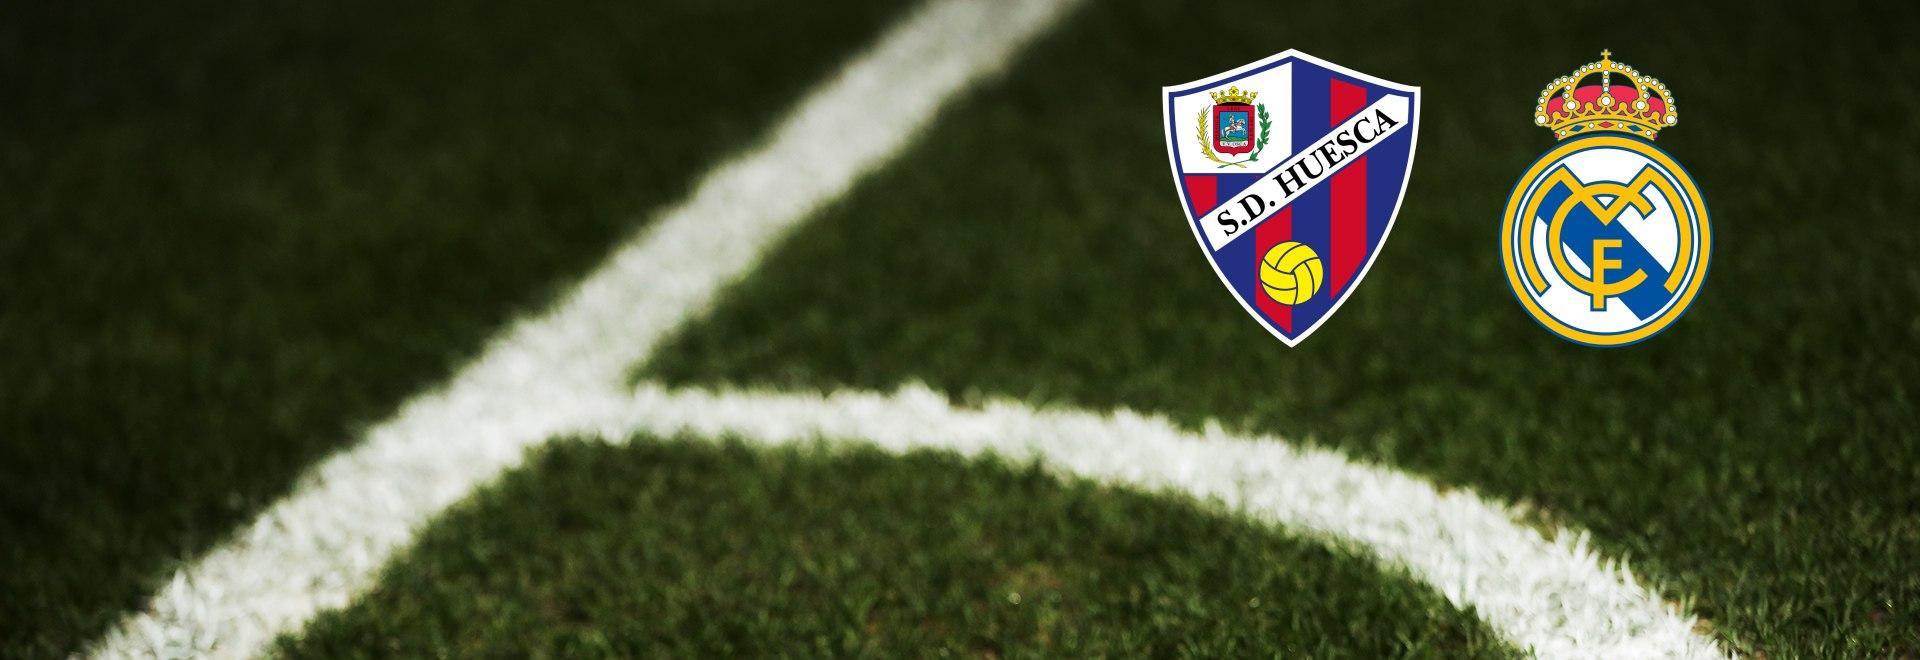 Huesca - Real Madrid. 22a g.